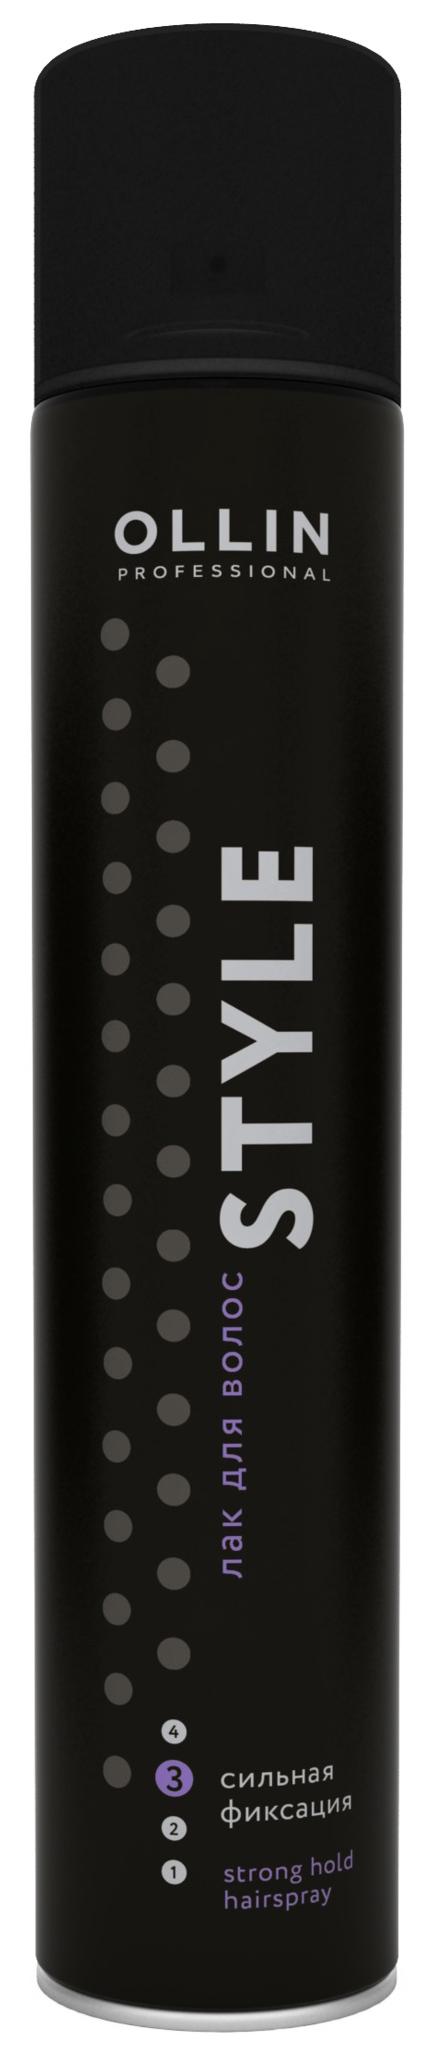 Лак для волос Ollin Professional Style Strong Hold Hairspray 500 мл